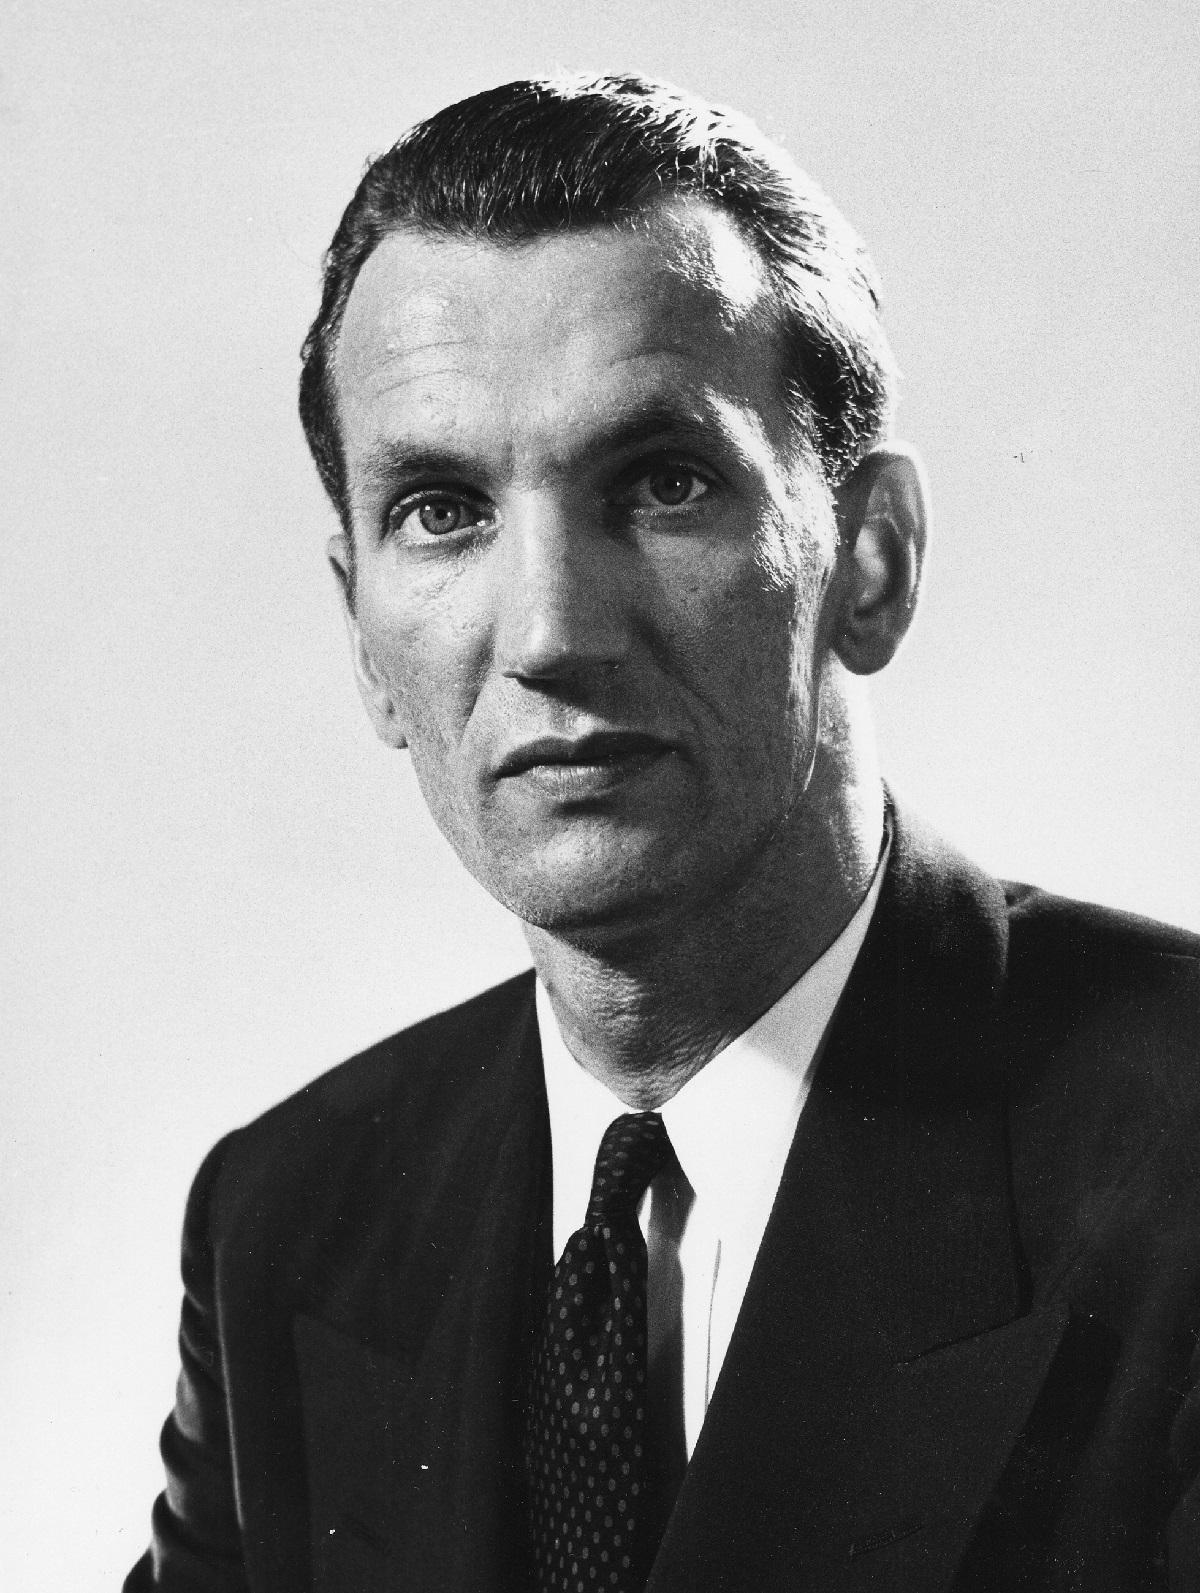 Head and shoulders photograph of Jan Karski